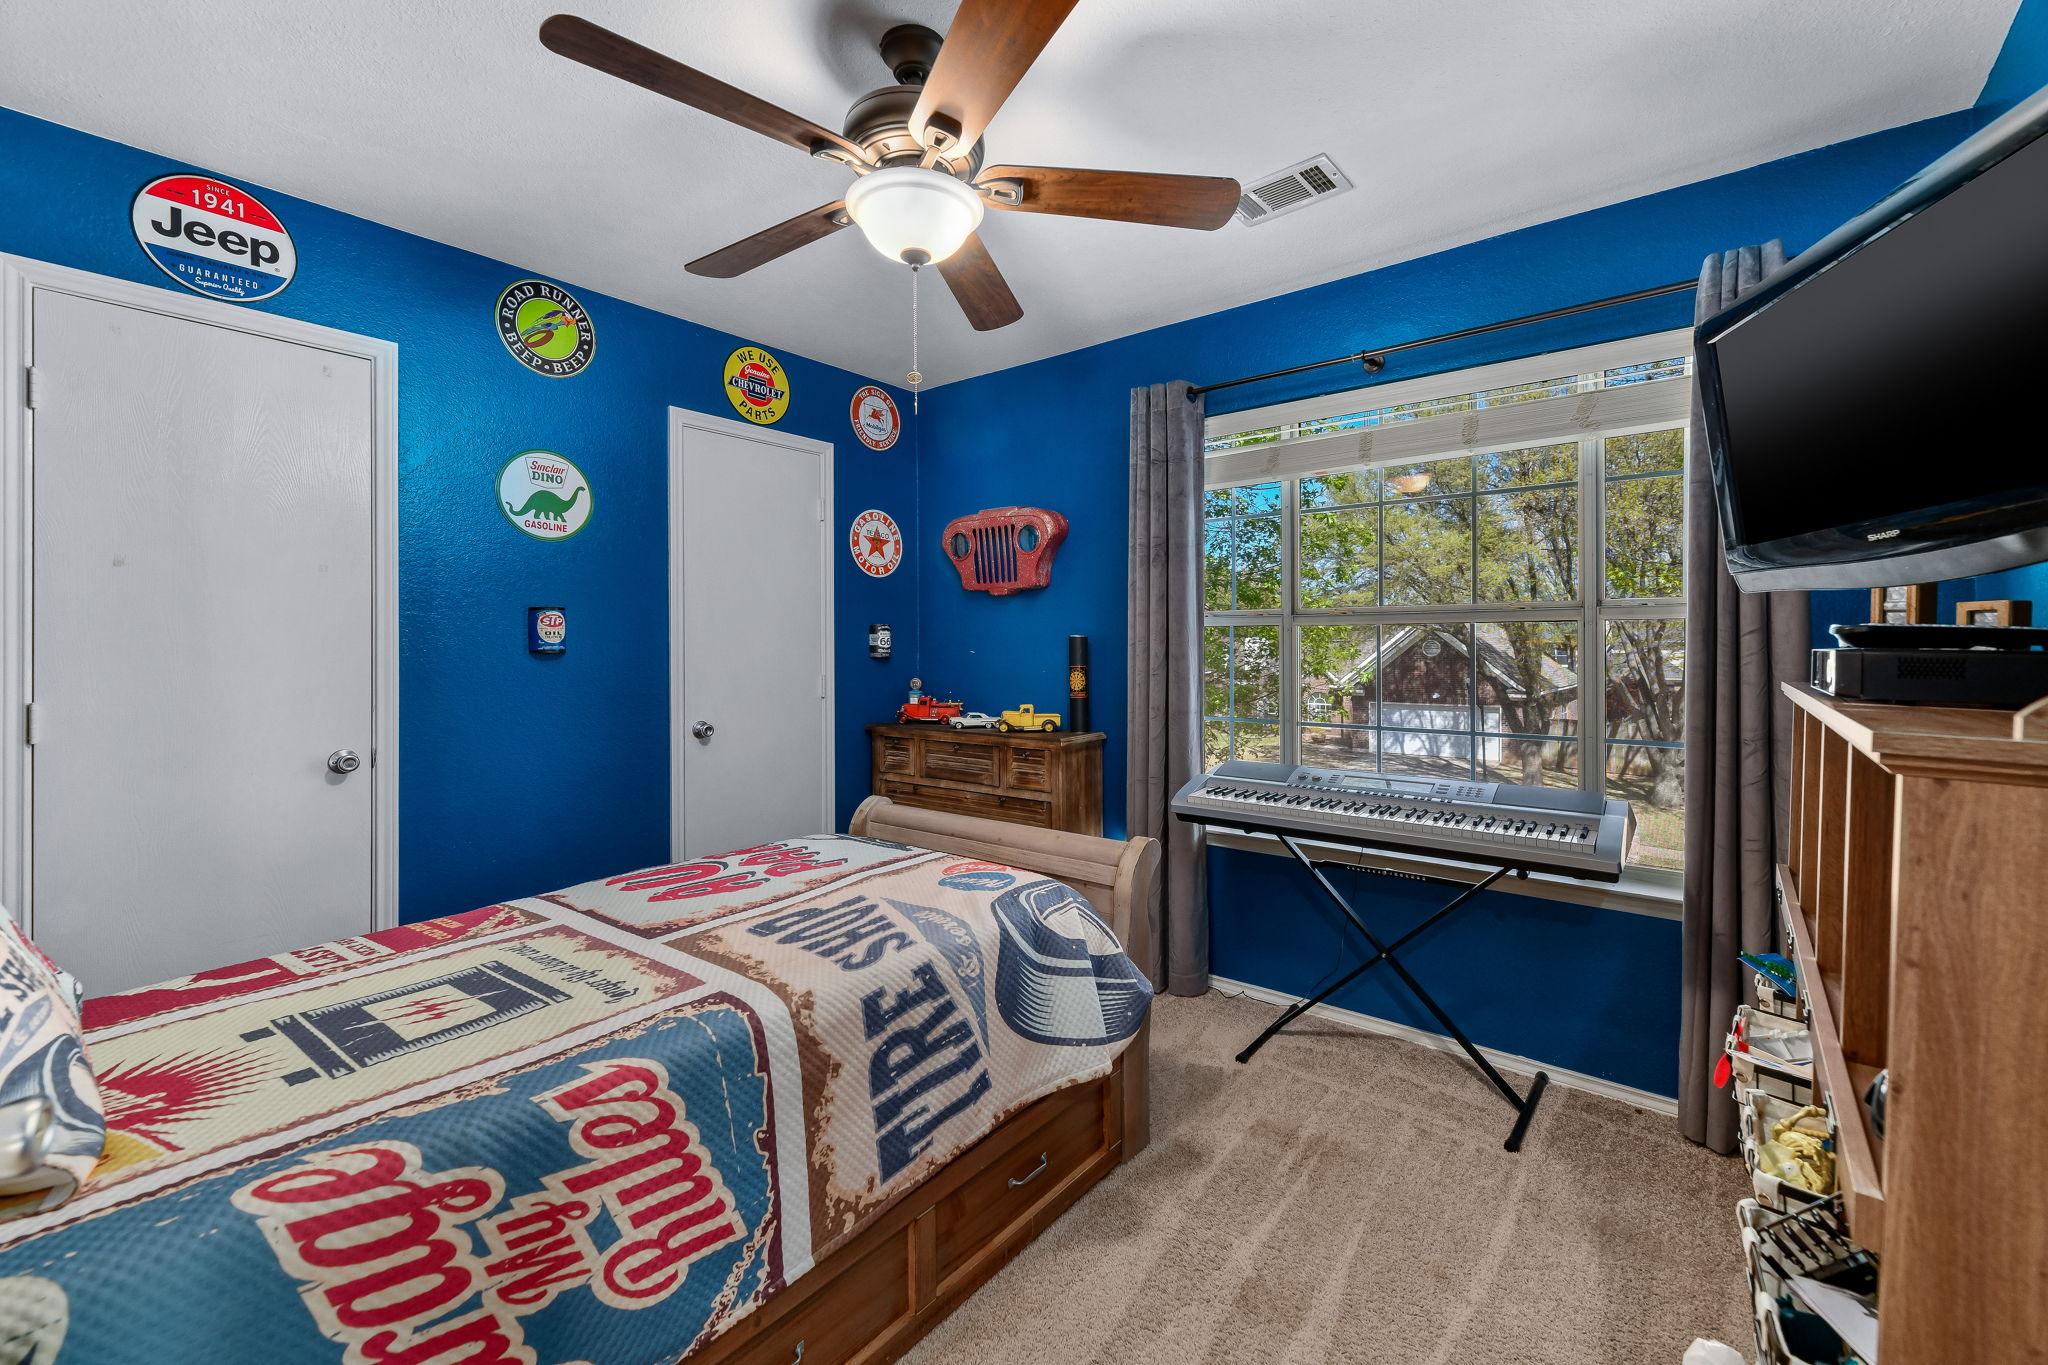 022-Bedroom 2-FULL